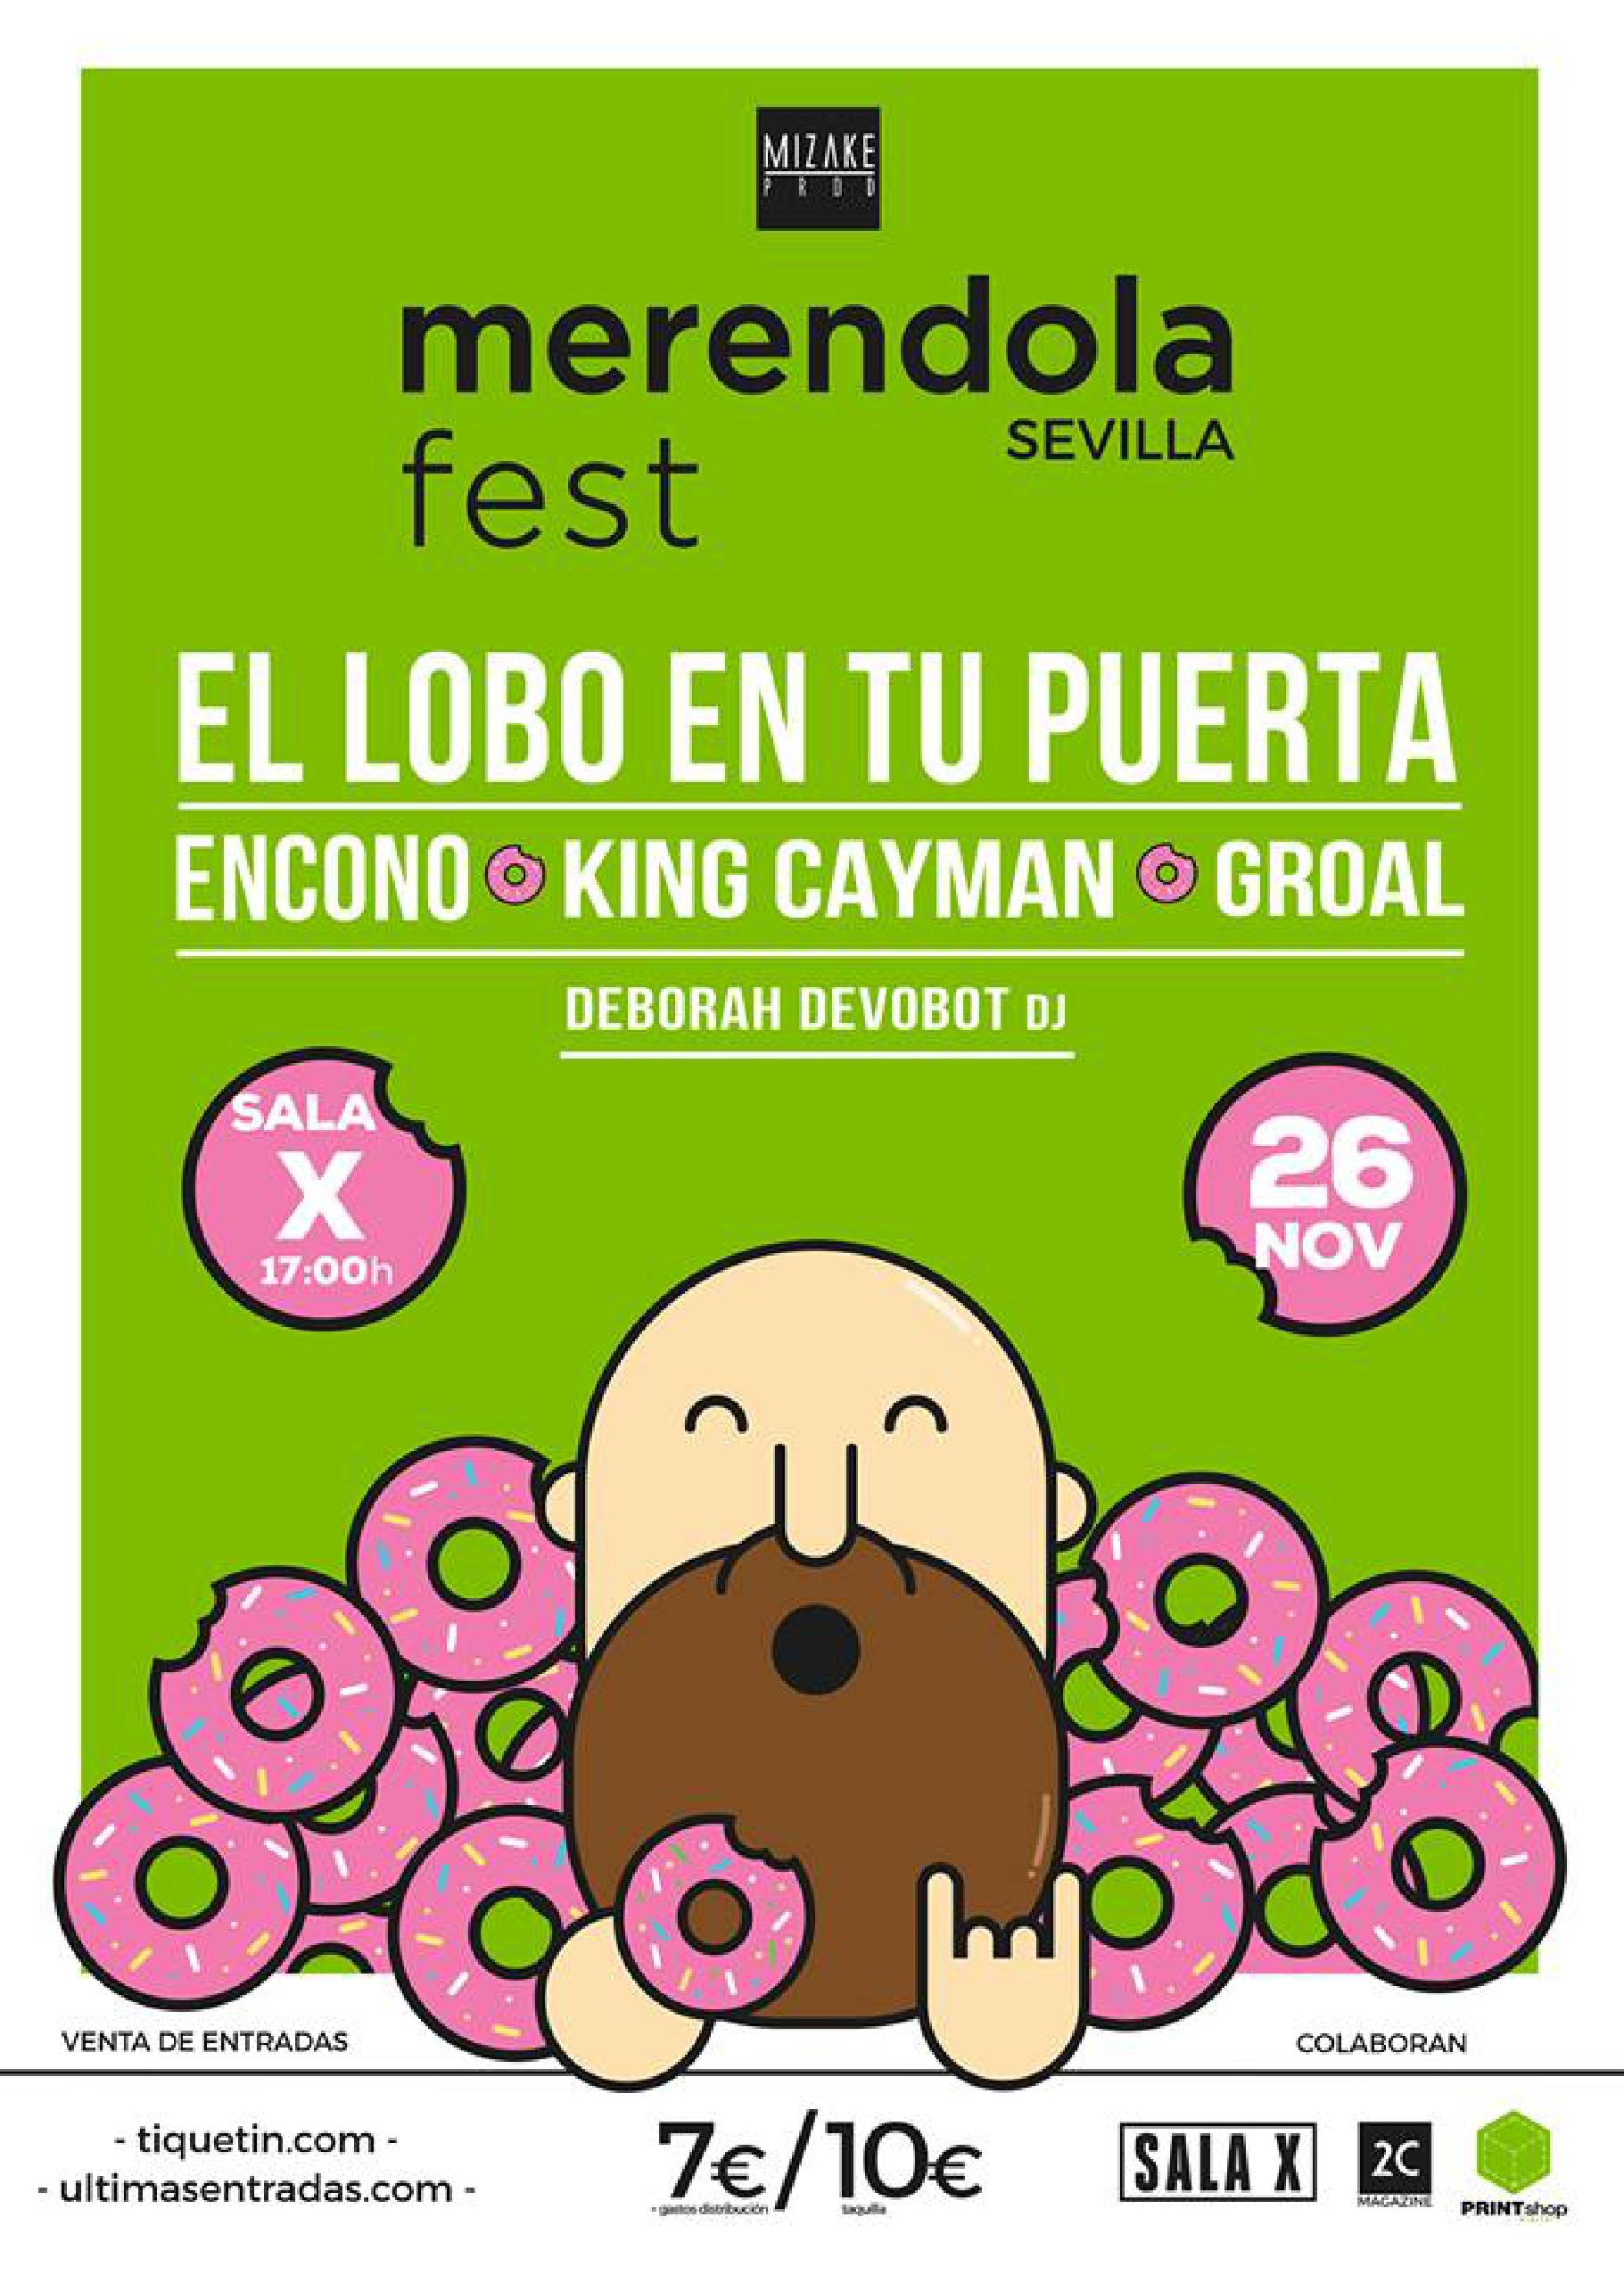 Merendola Fest Sevilla